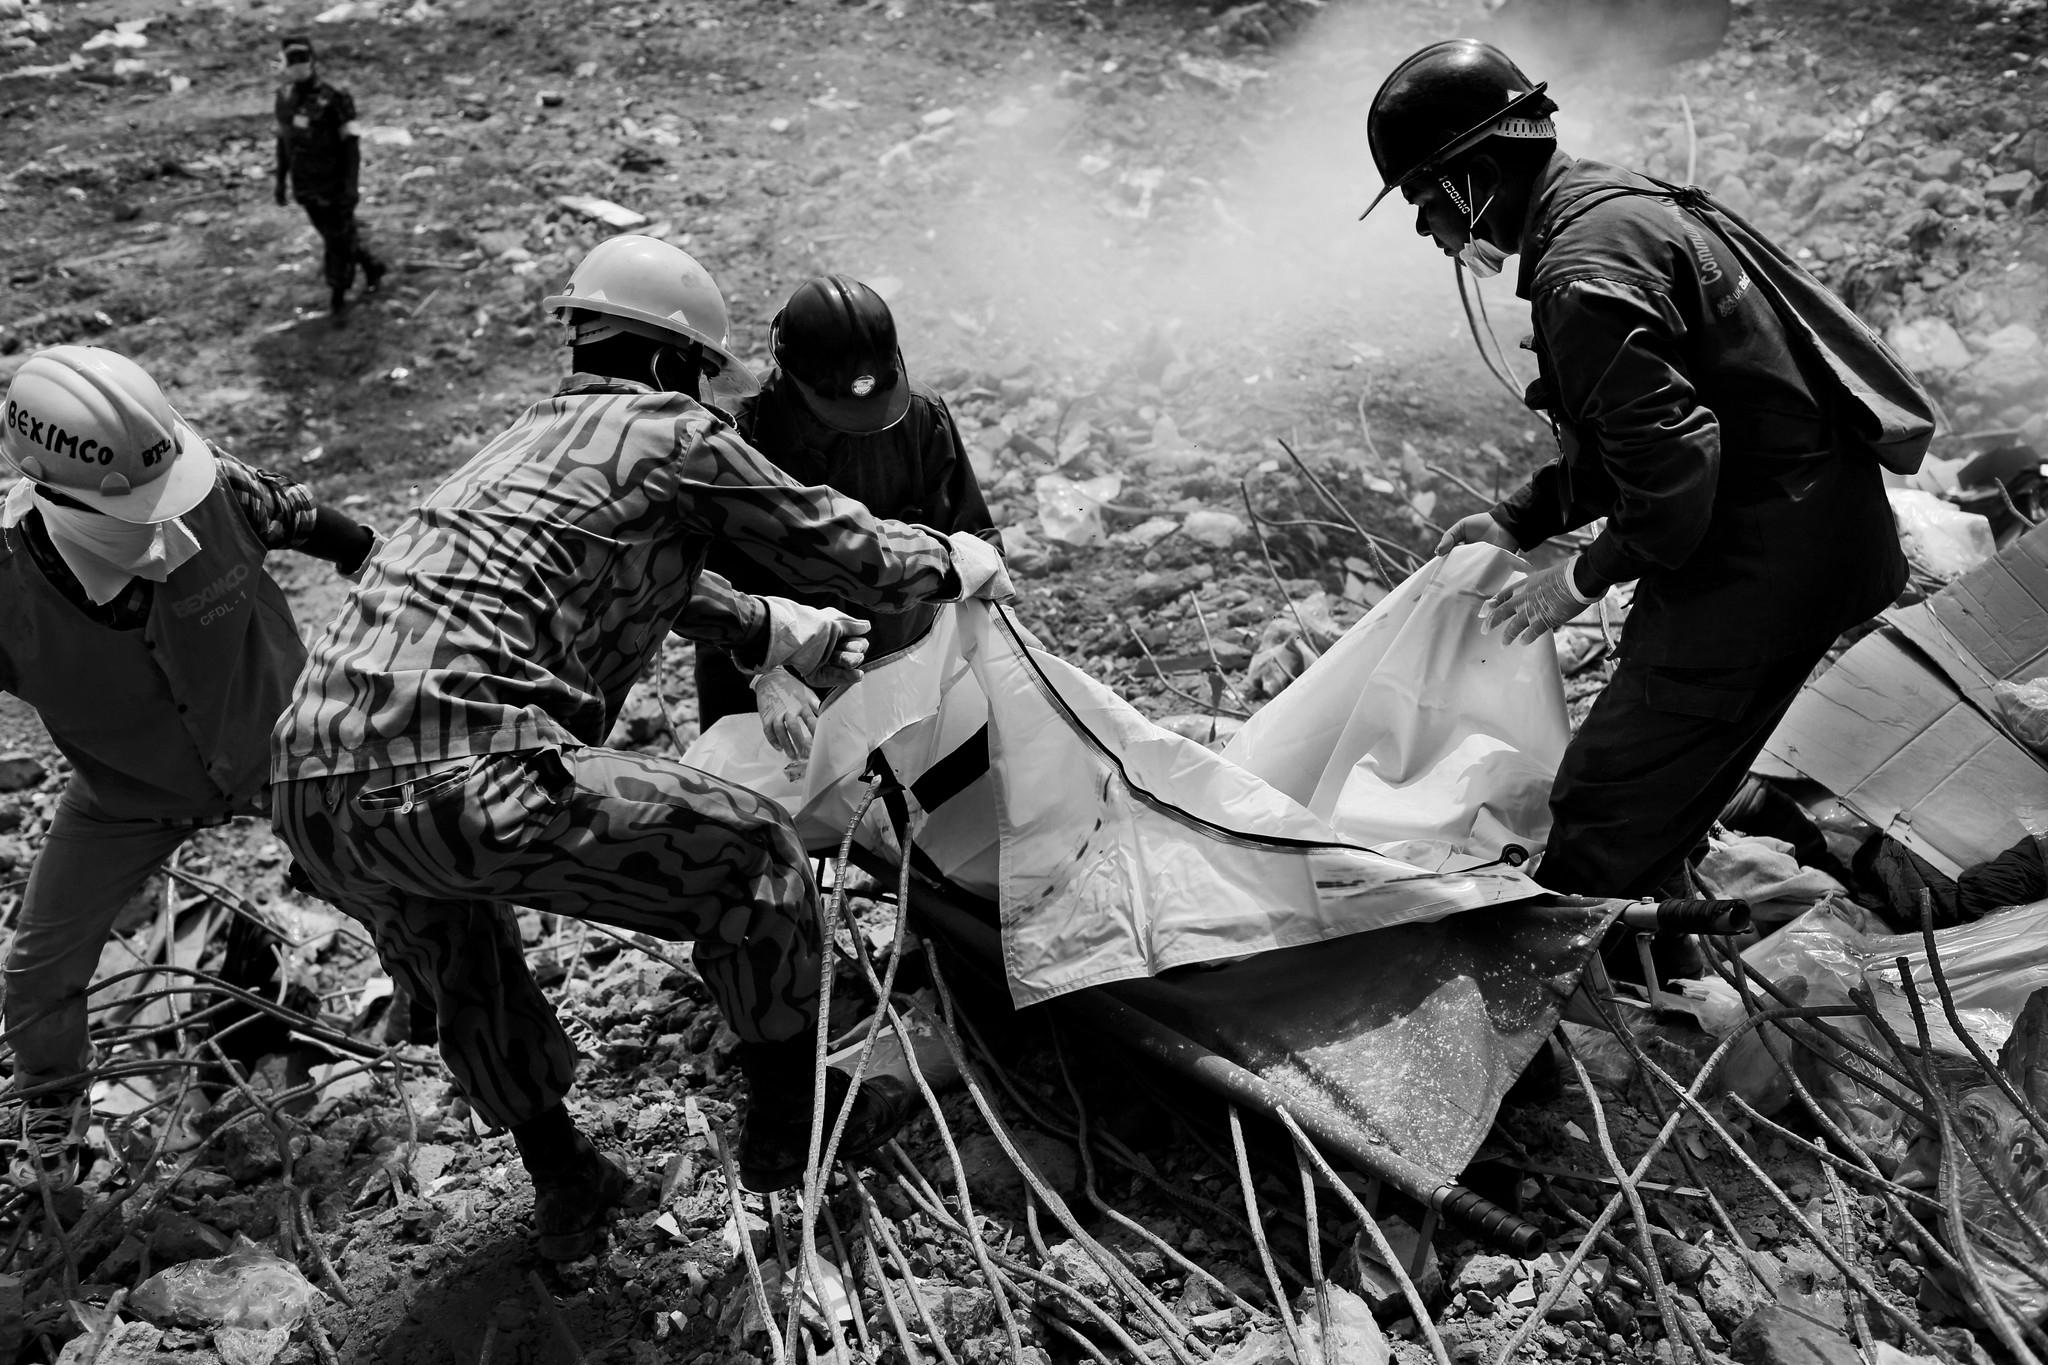 Savar Tragedy, Garments Industry and Bangladesh